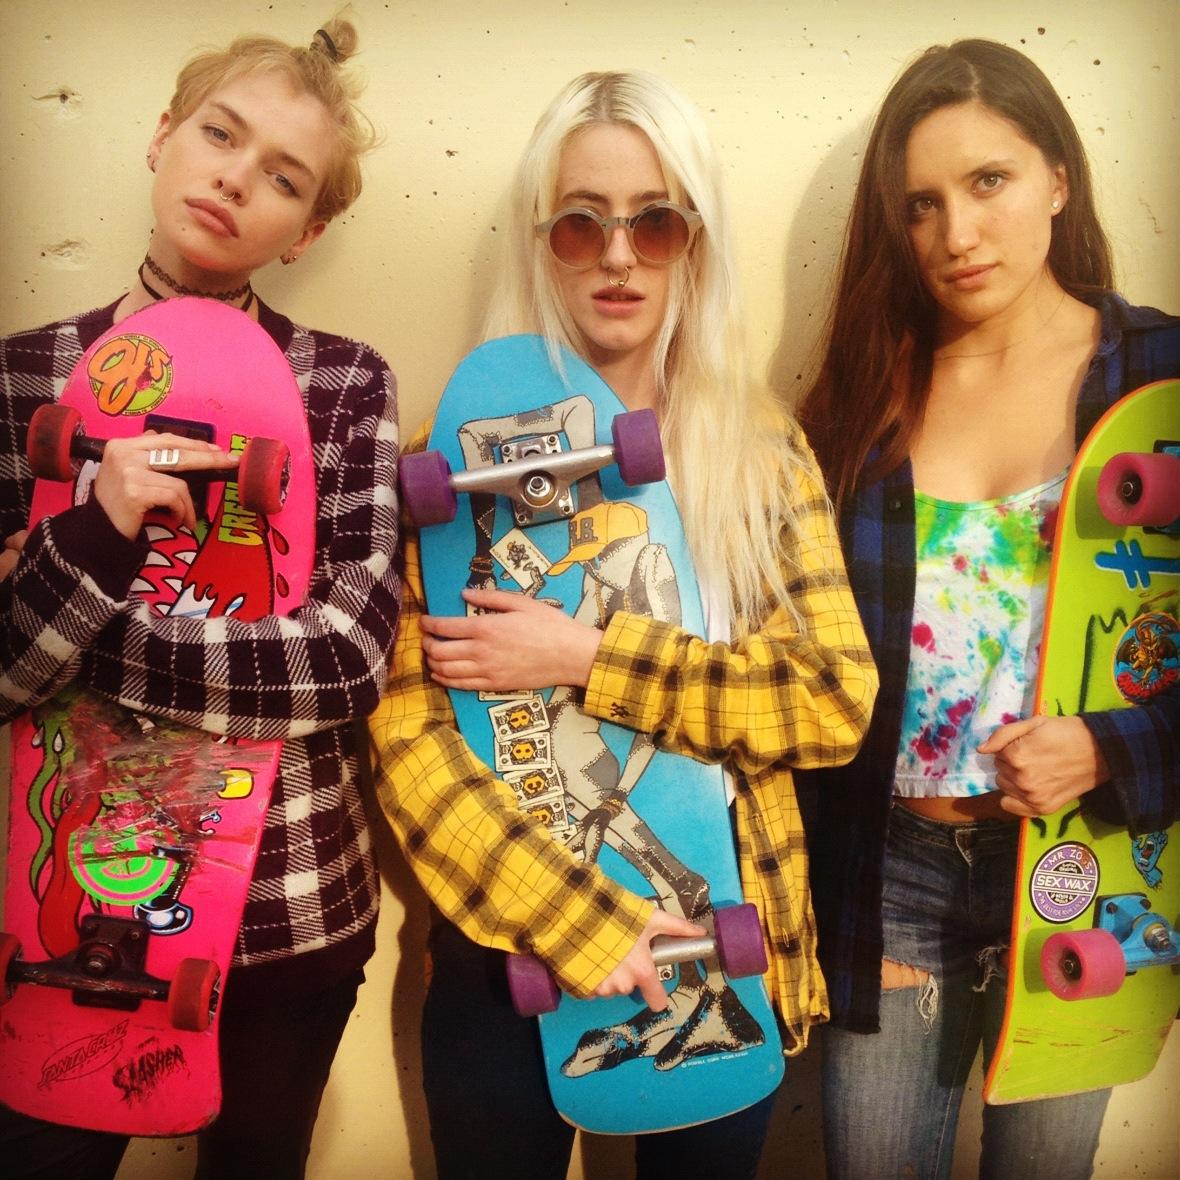 David Mushegain: California girls